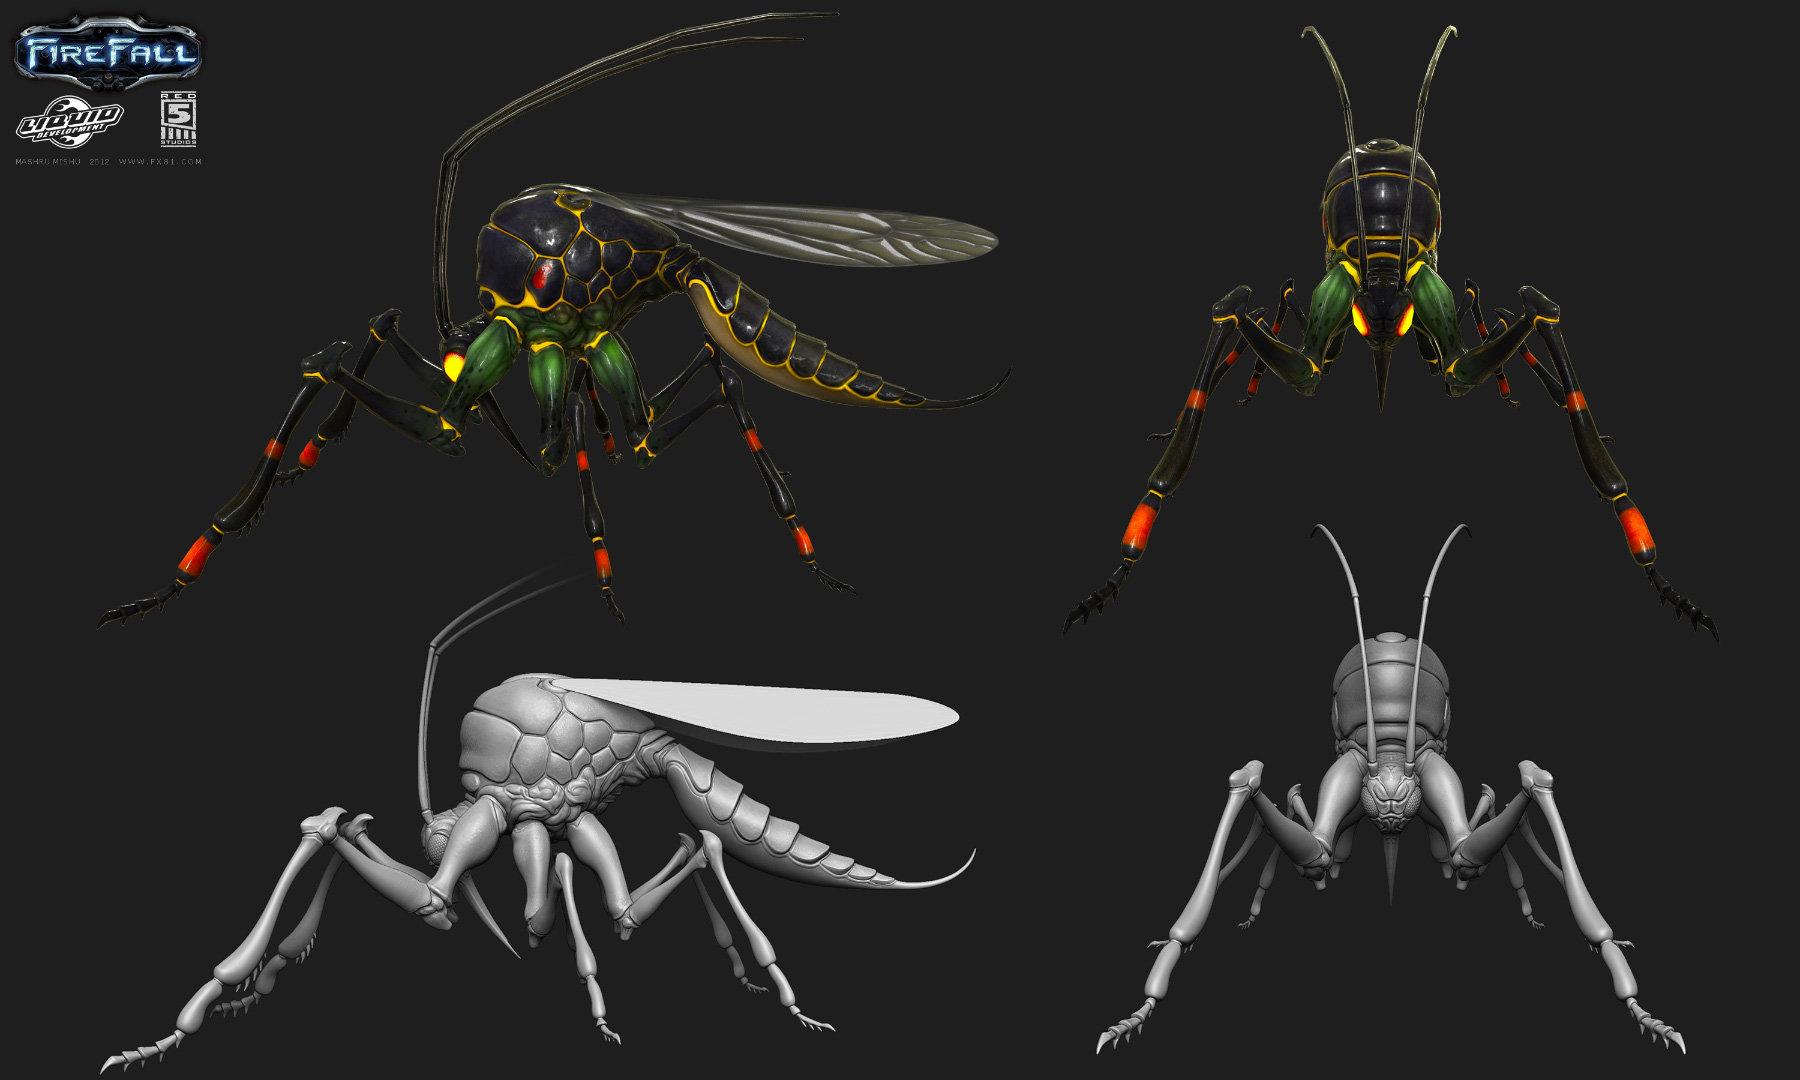 Mashru mishu firefall jungle mosquito